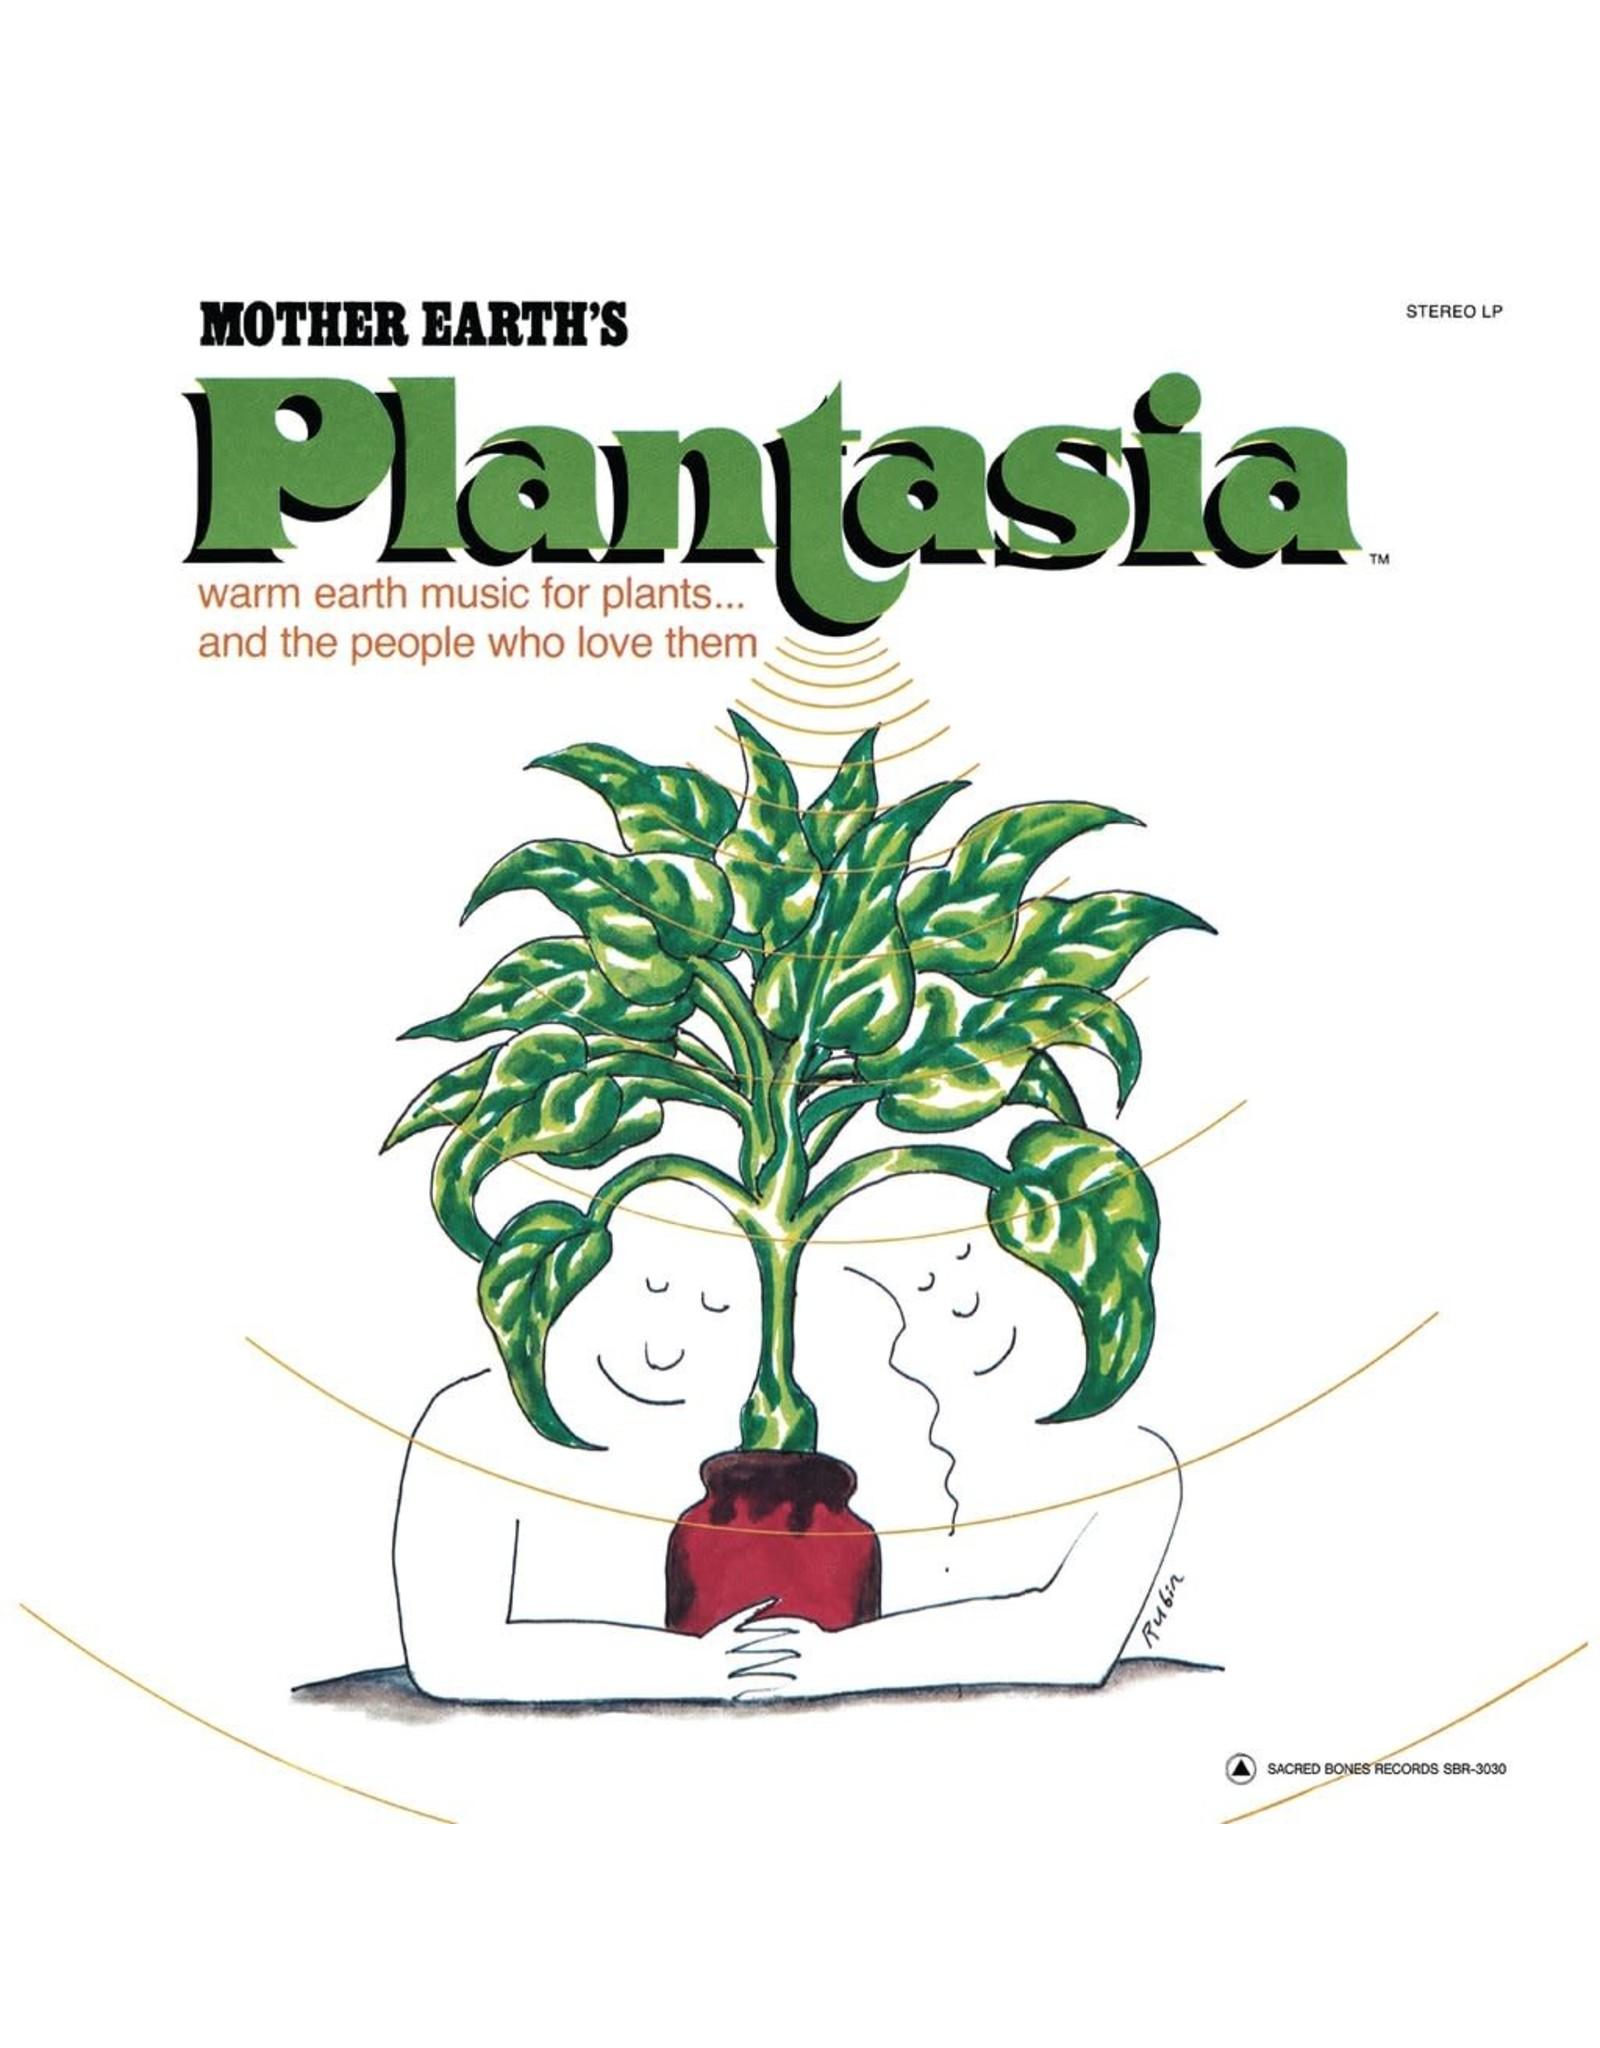 Garson, Mort - Mother Earth's Plantasia (2LP 45rpm) LP